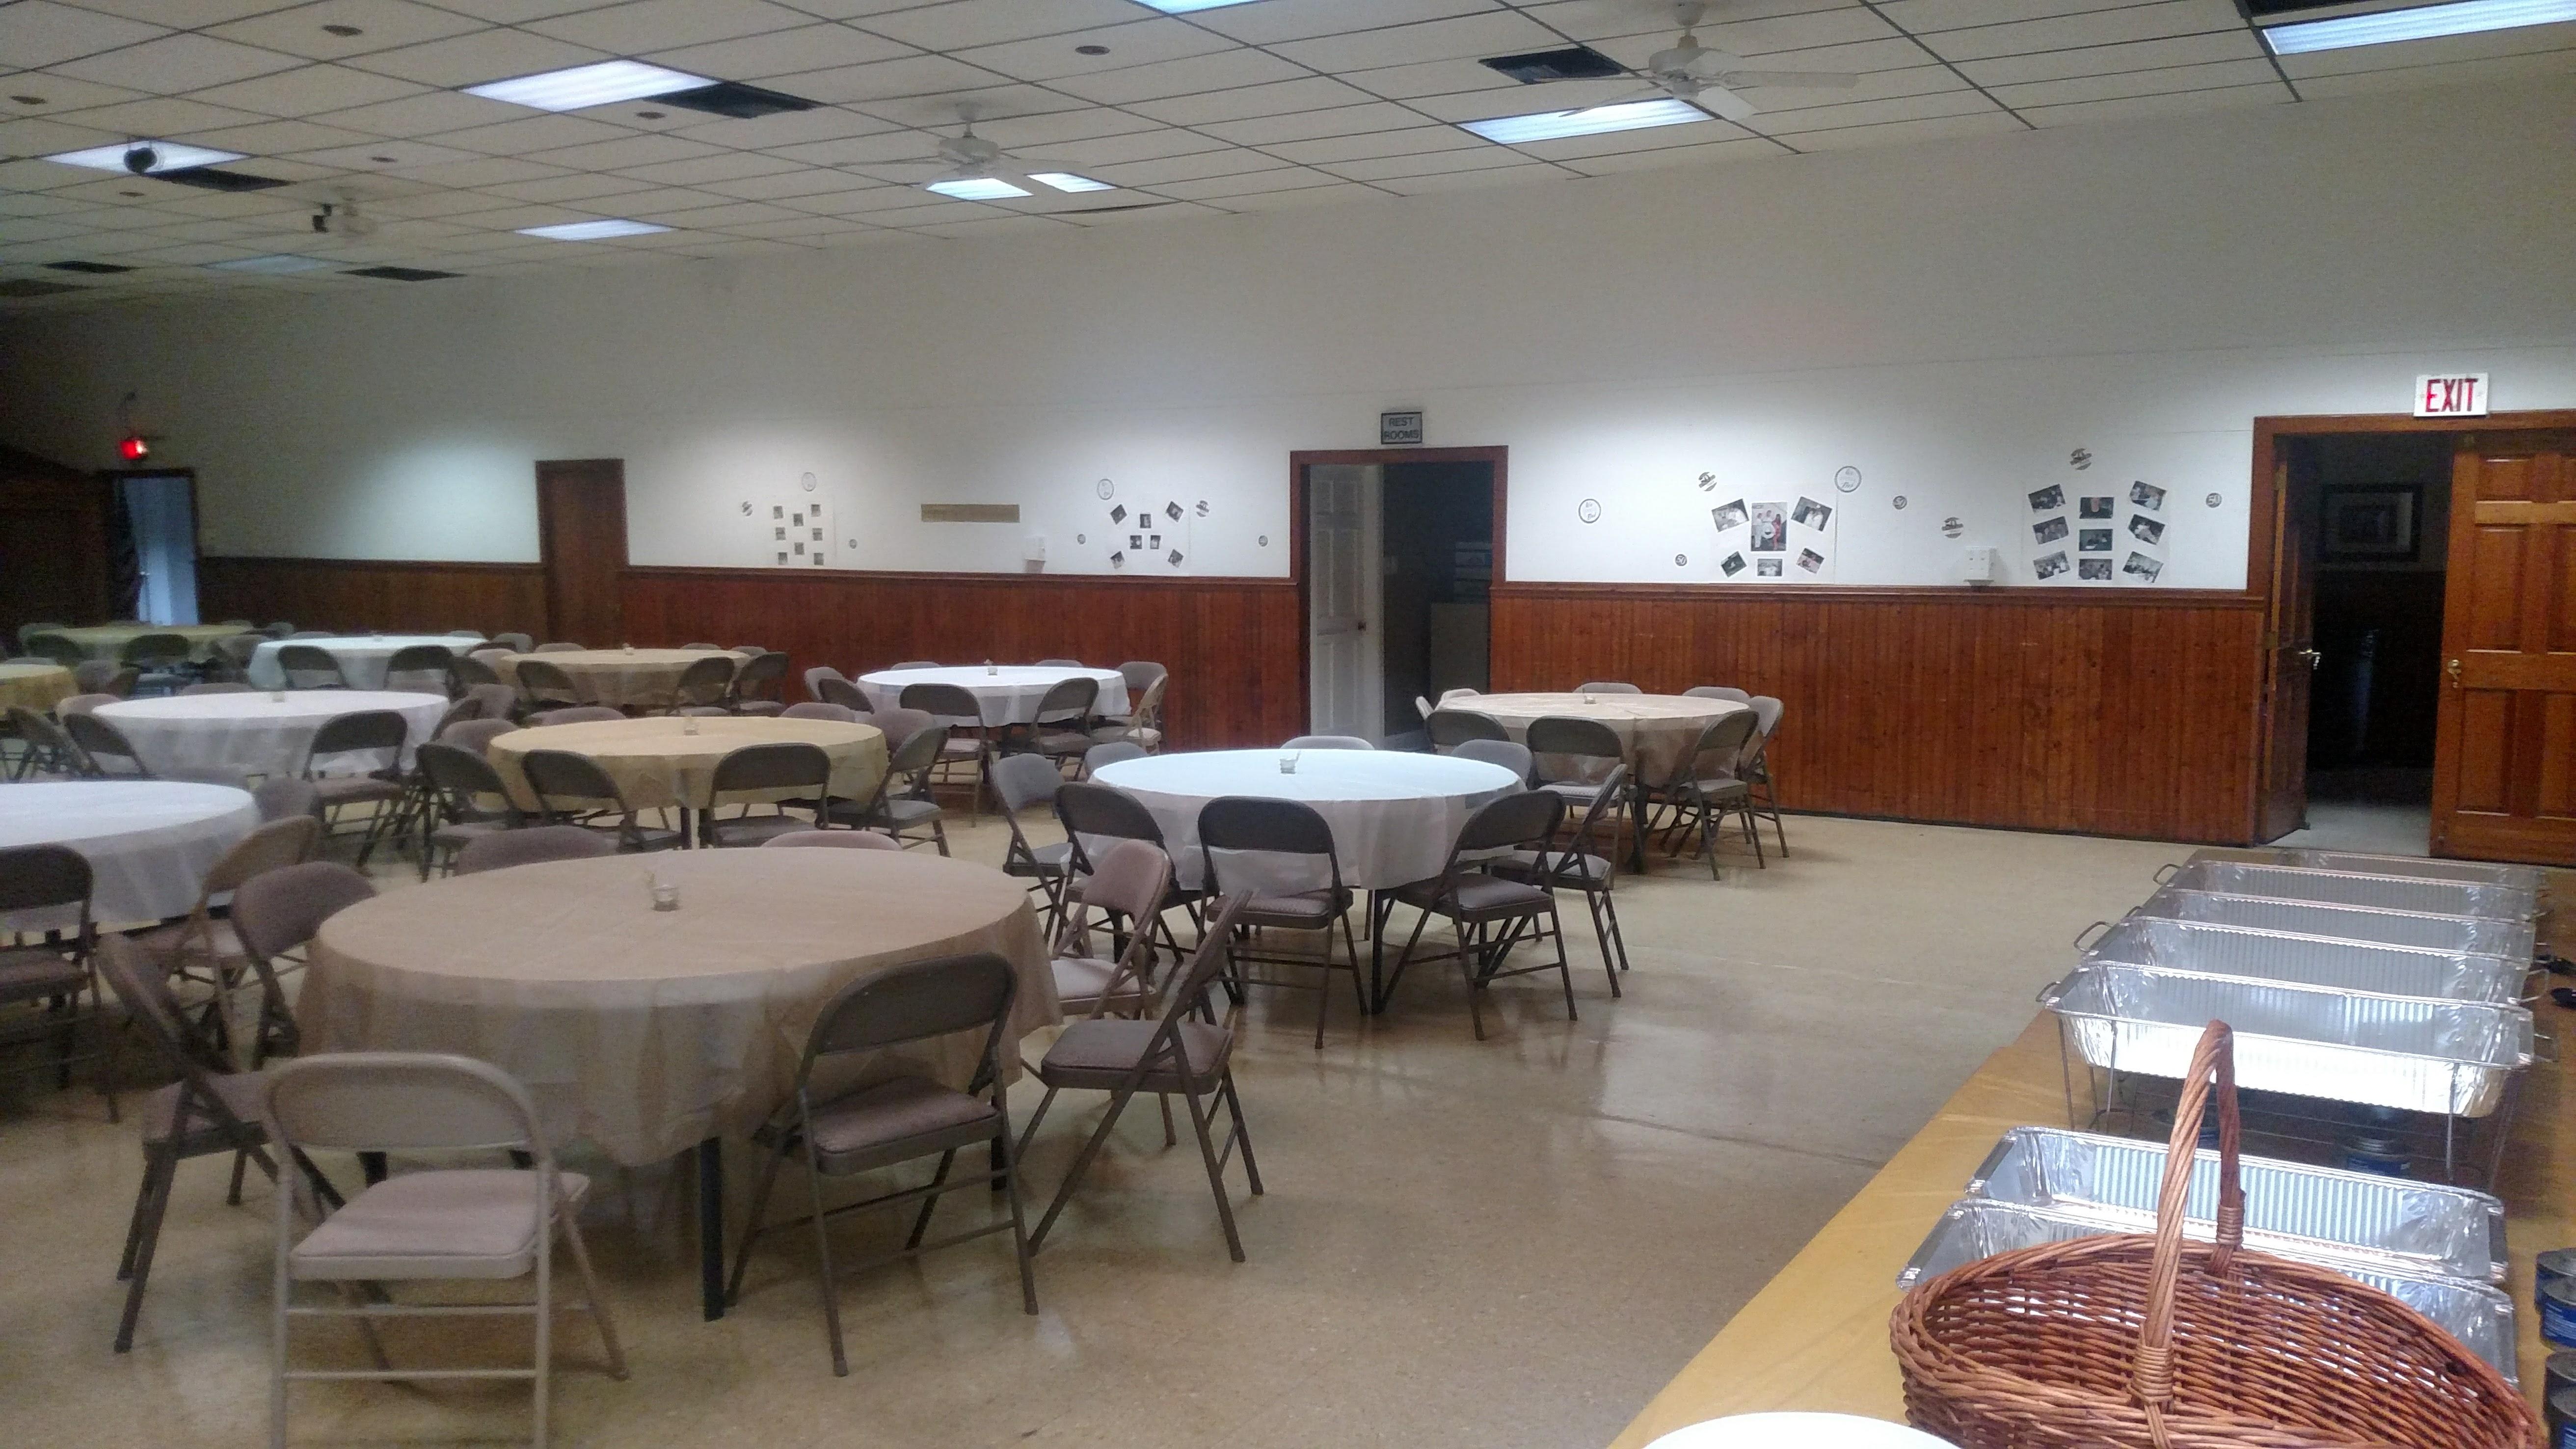 Air Conditioner Rental >> American Legion Post 133 Hall Rentals in Woodbury, NJ